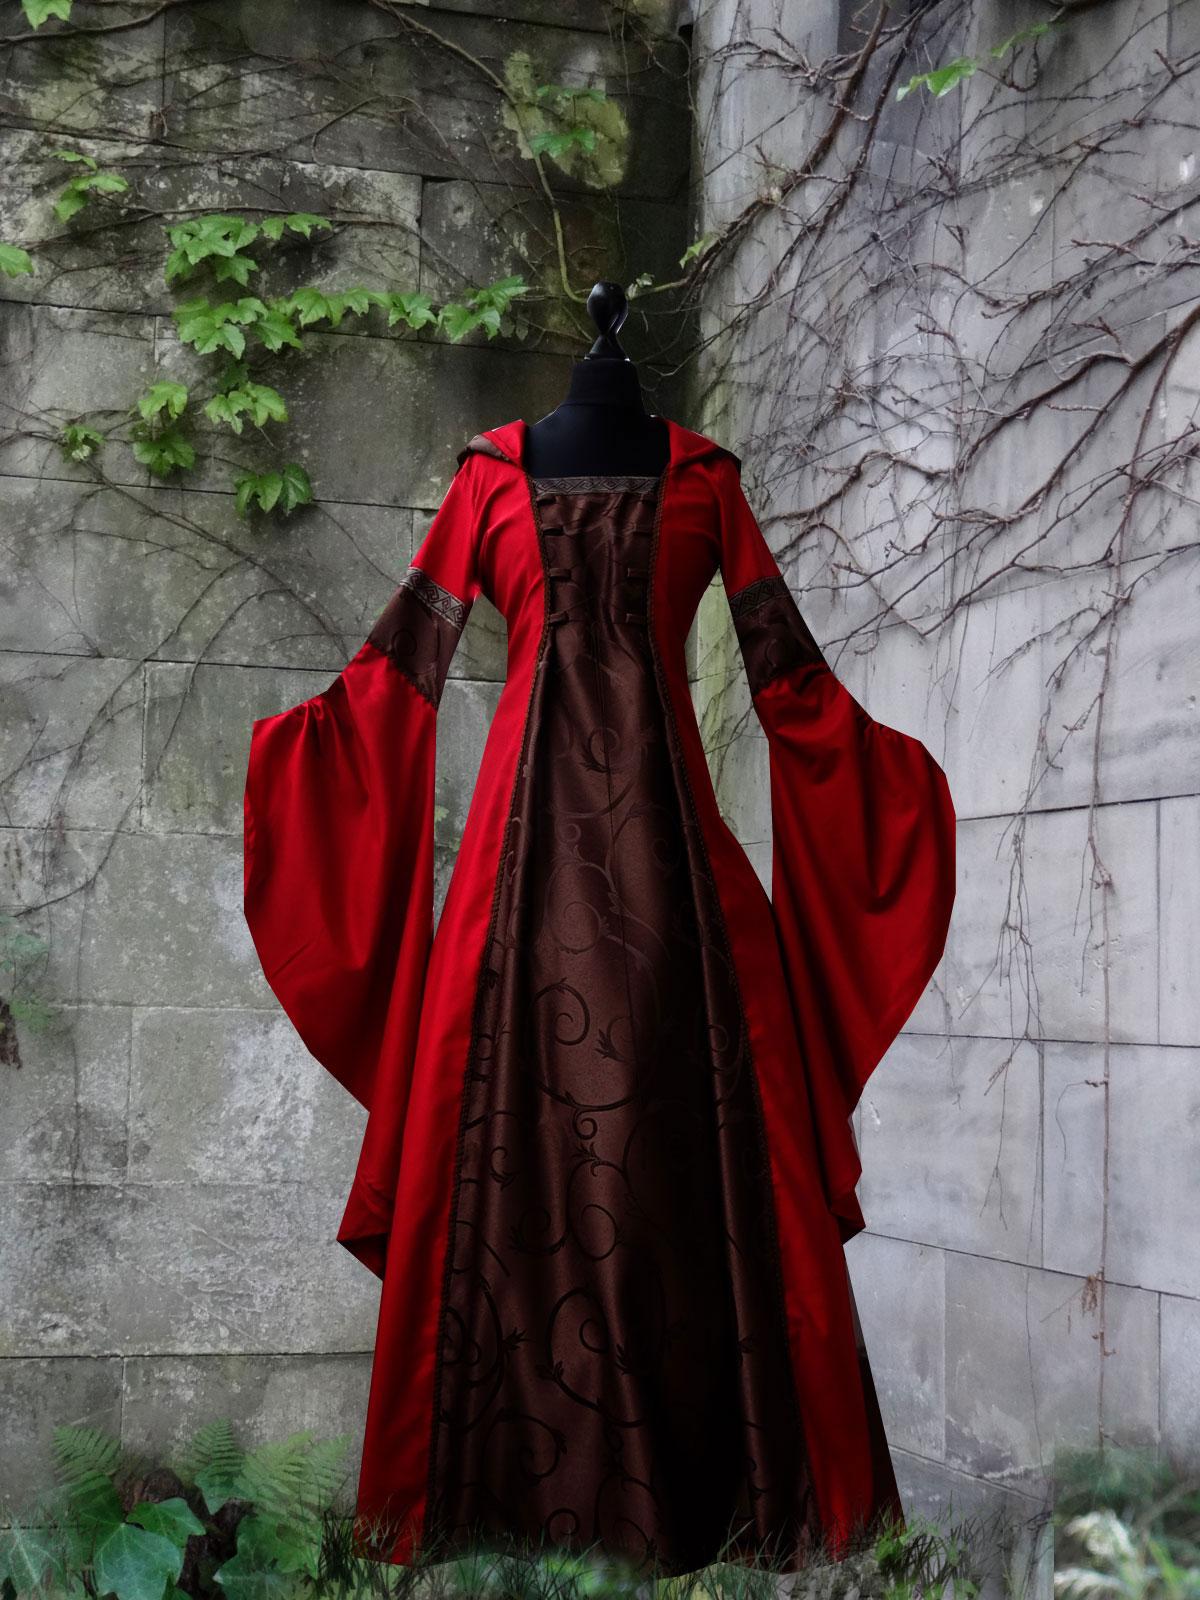 Brokatkleid Mittelalter Kapuzenkleid braun rot Trompetenärmel Medieval Dress